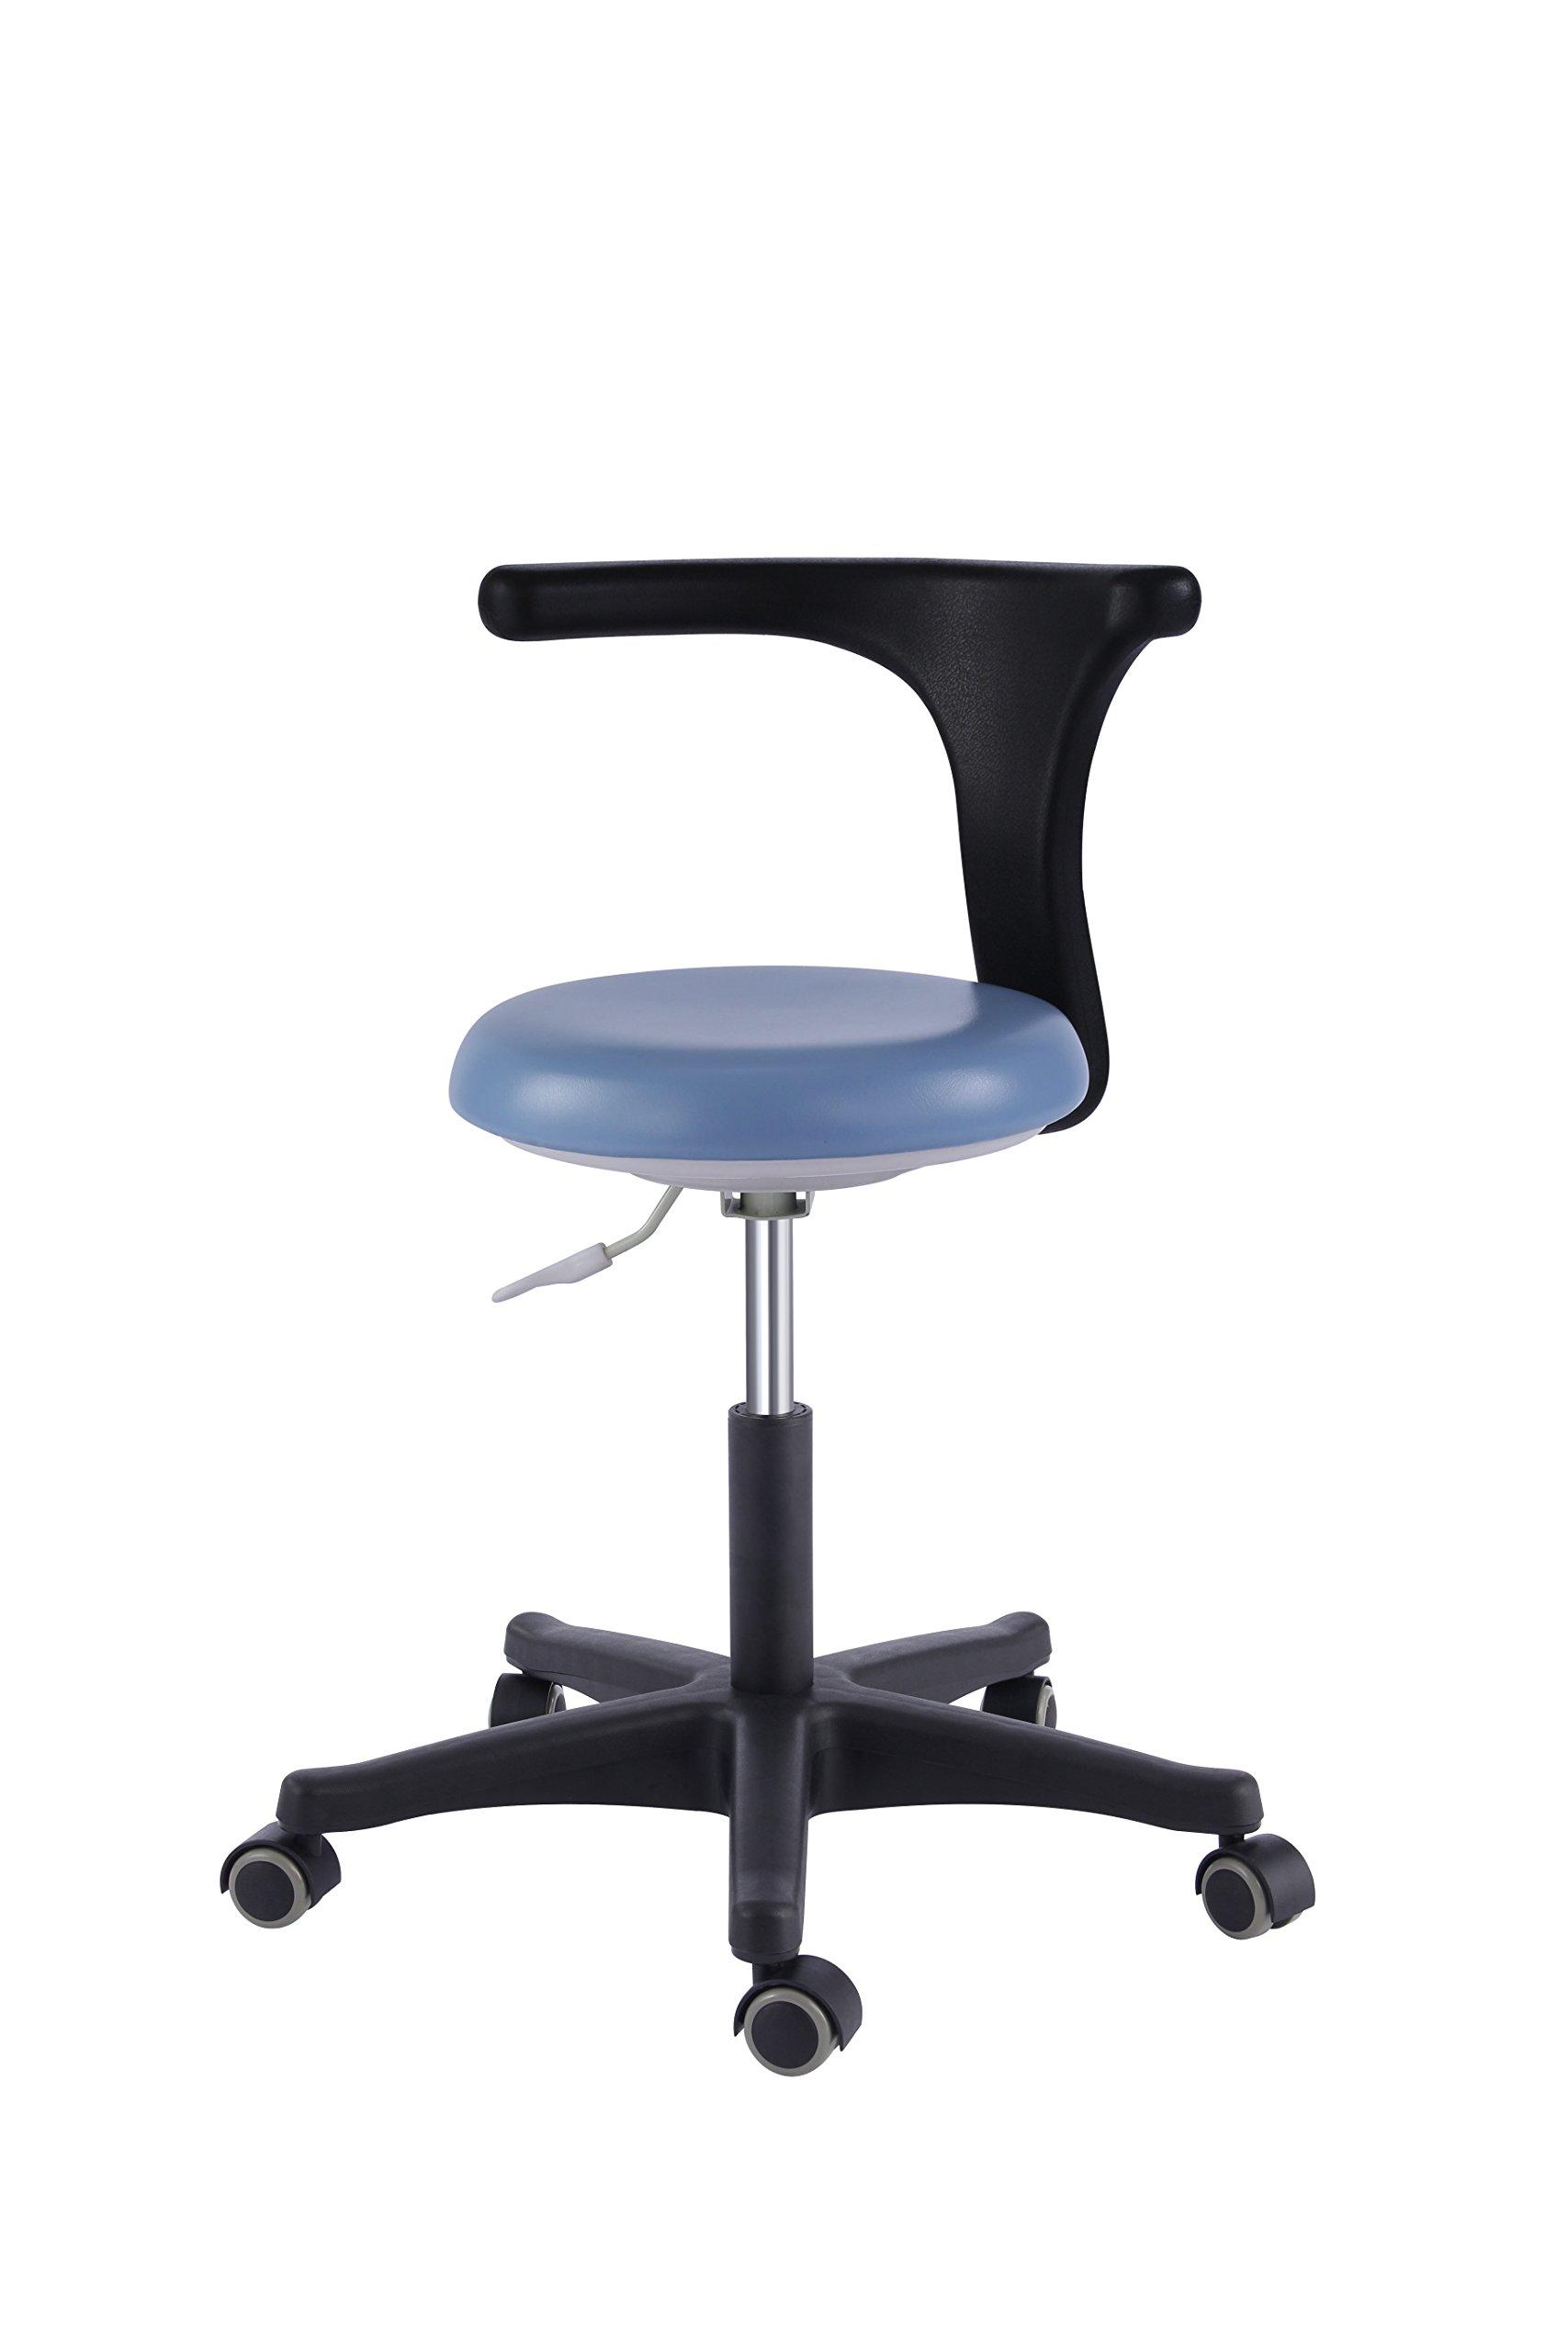 Zeta Dental Office Stools Assistant's Stools Medical Adjustable Mobile Chair PU Black (14#)